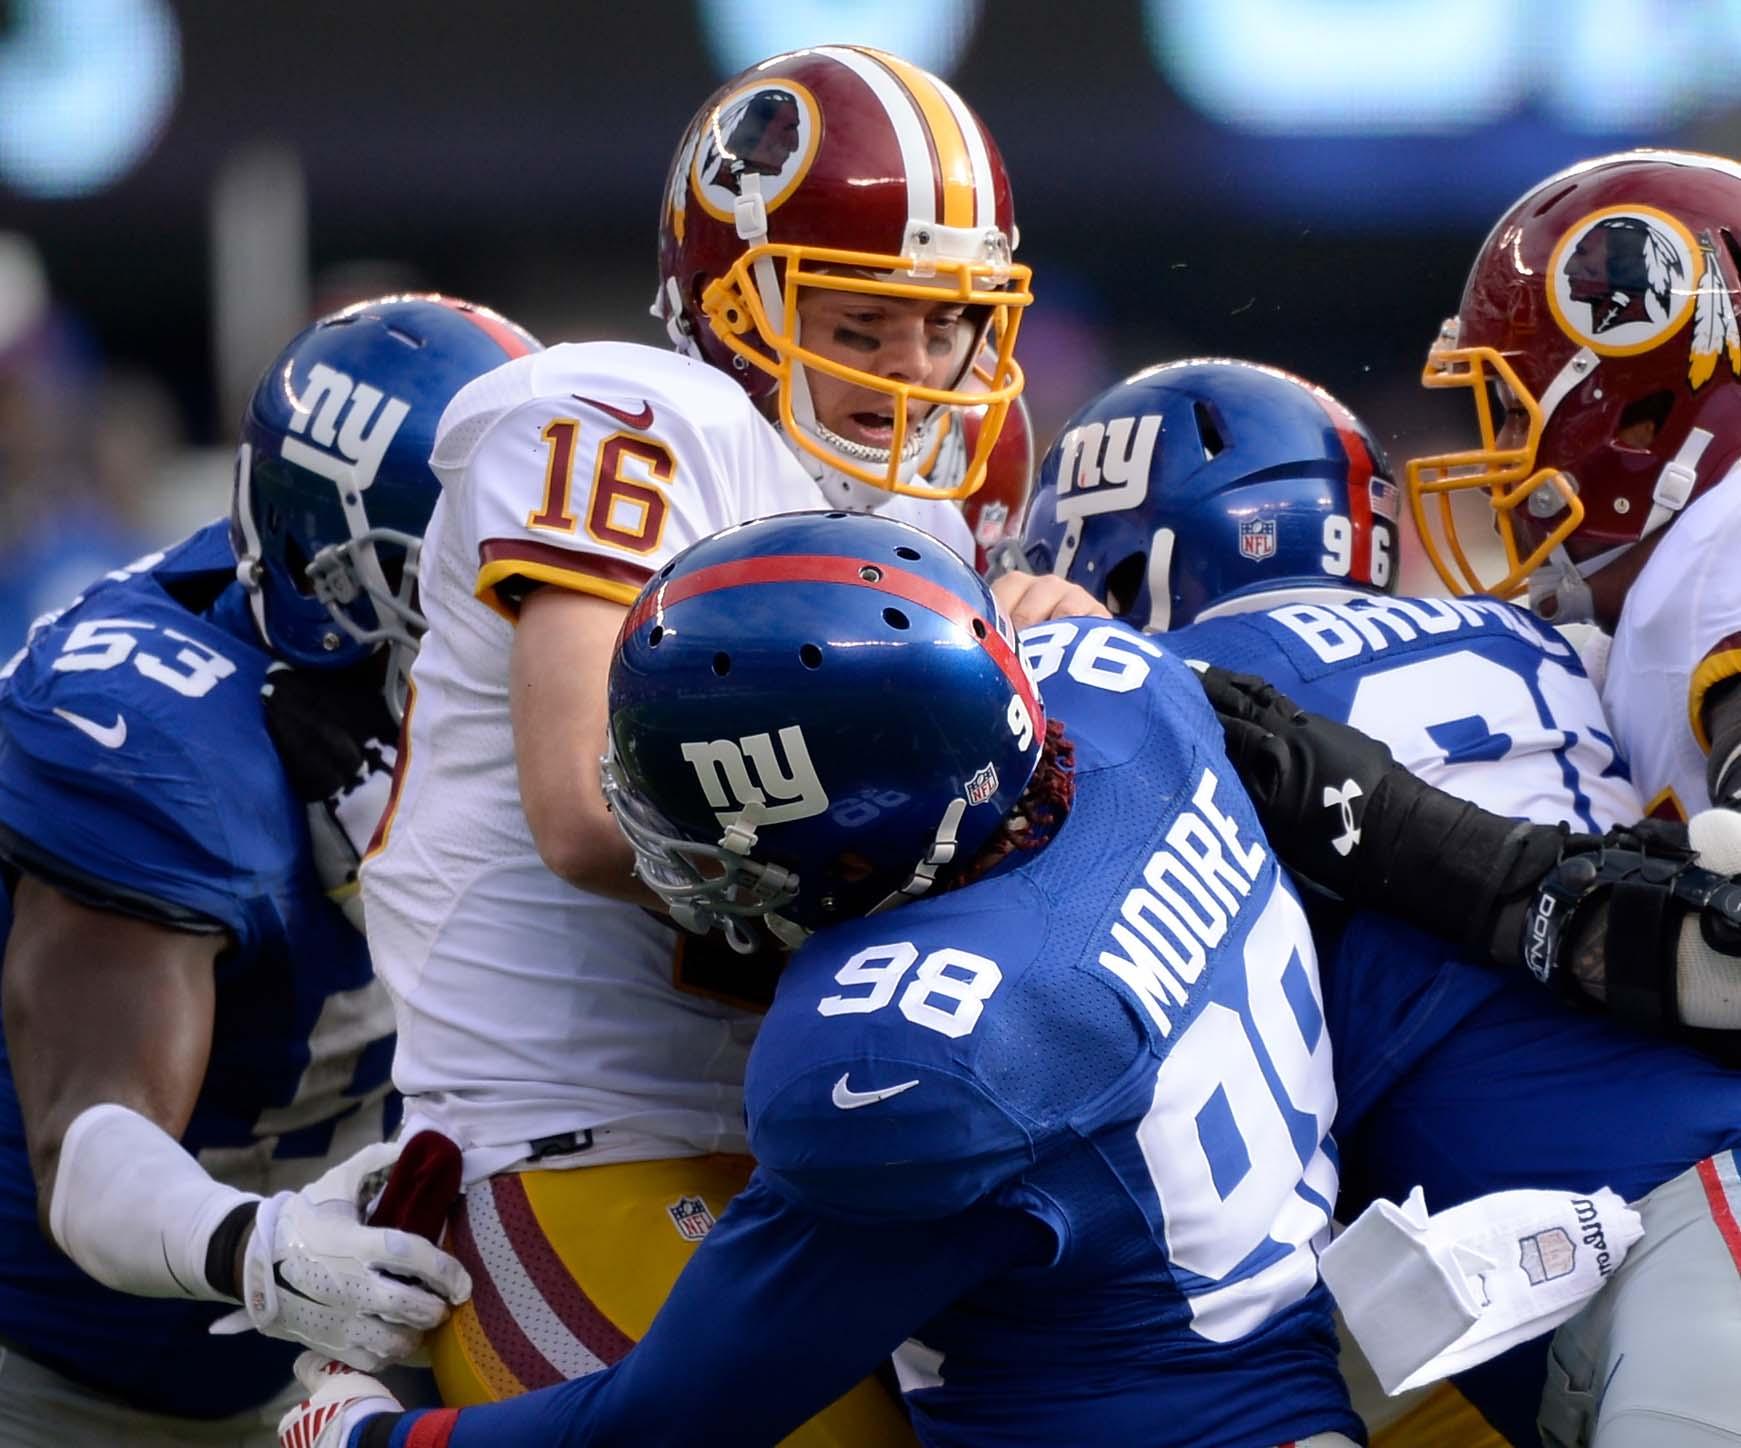 Washington quarterback Colt McCoy is sandwiched by Giants defenders